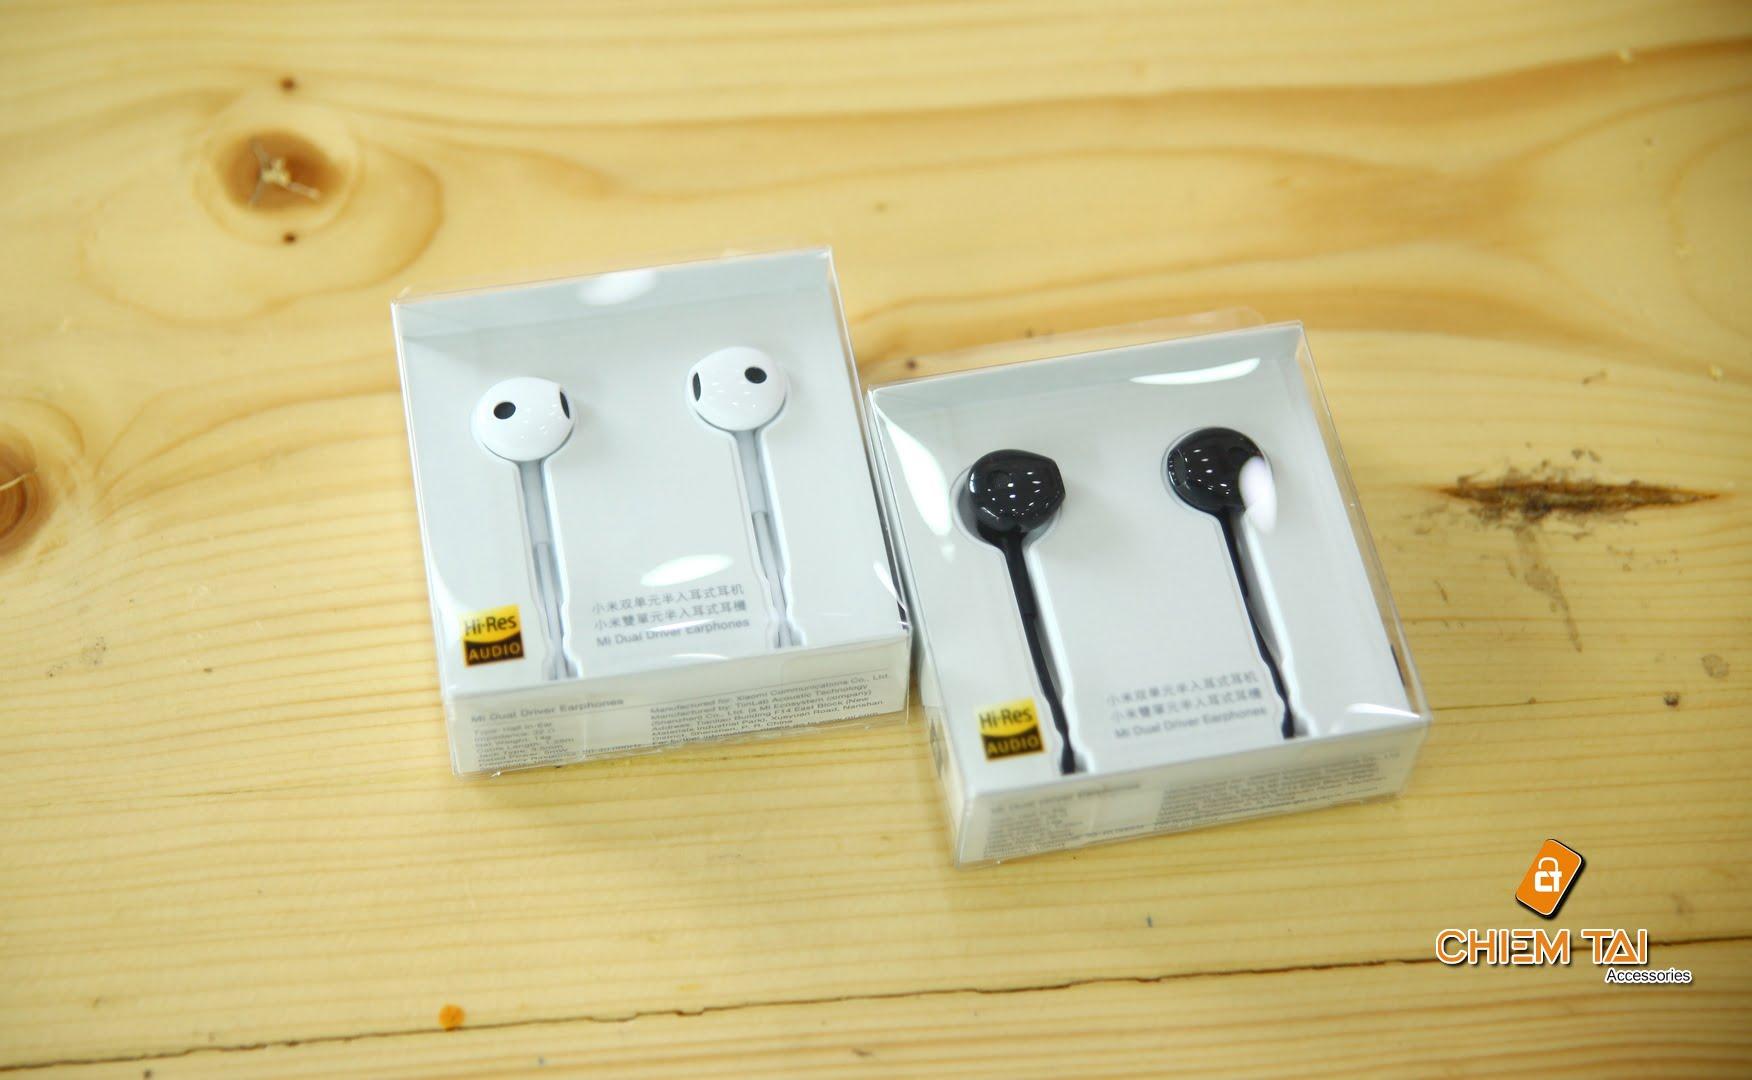 tai nghe gom xiaomi mi dual unit half ear 605c44c810134